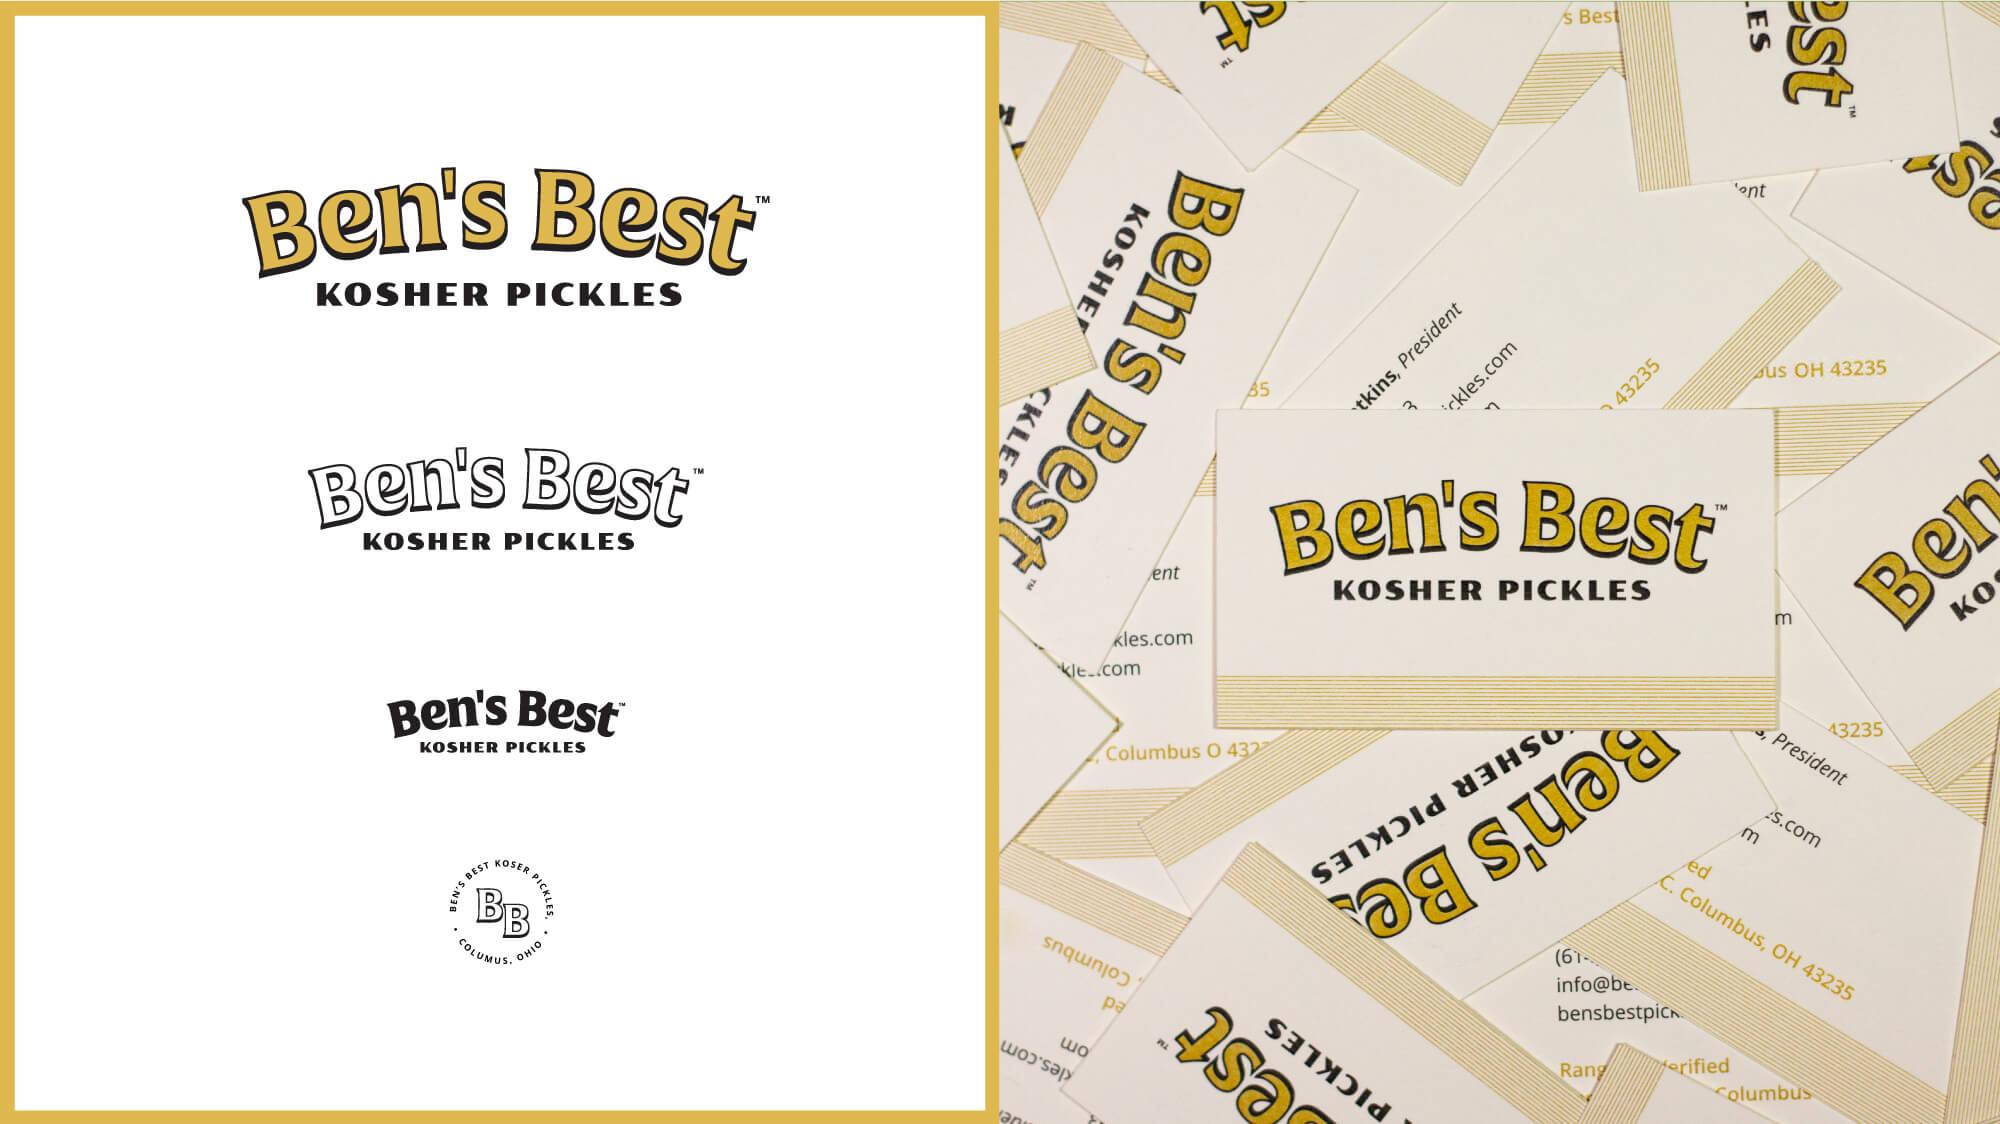 Bens-Best-Brand-02.jpg